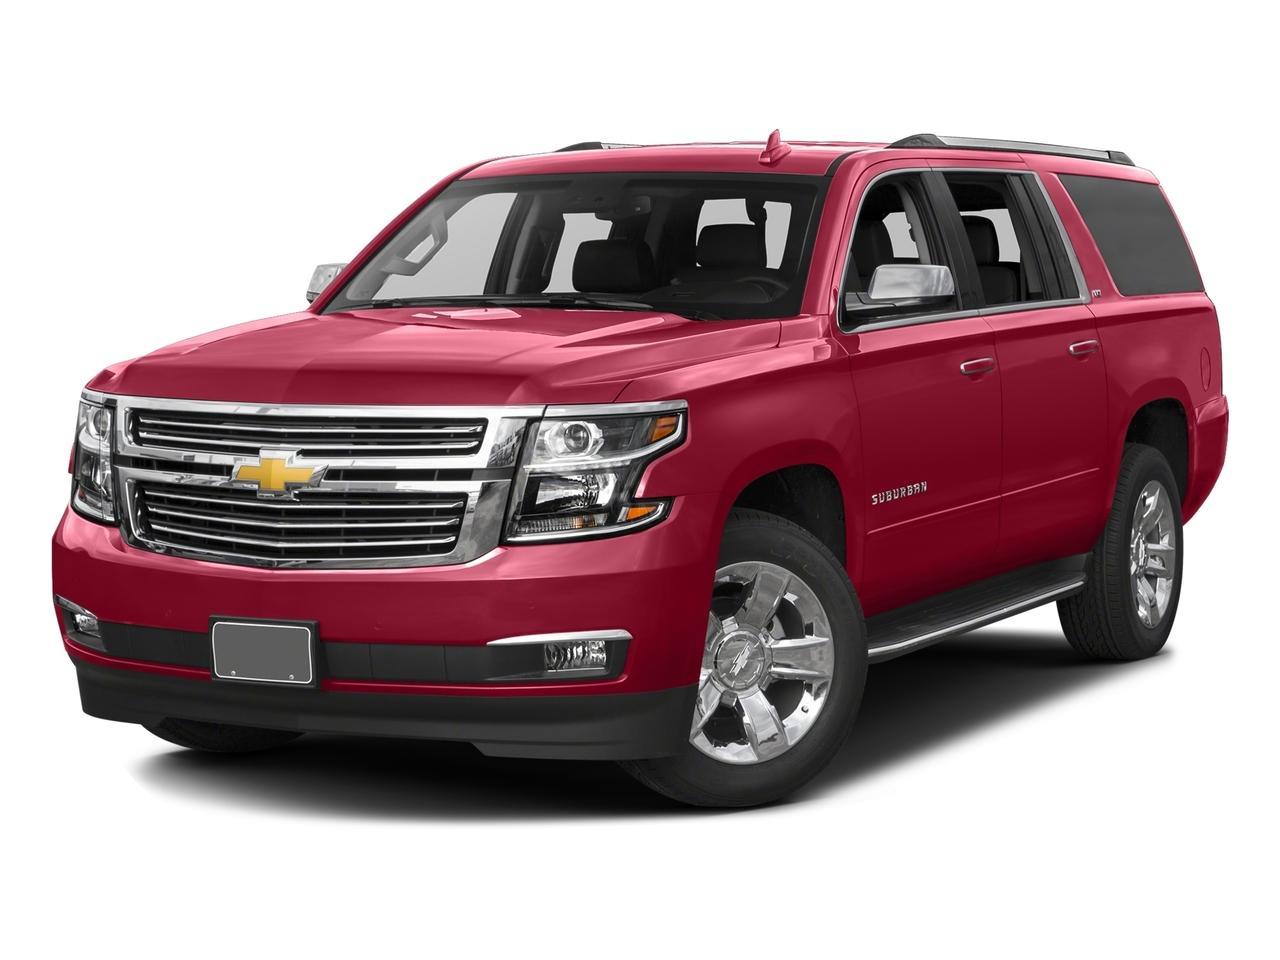 2016 Chevrolet Suburban Vehicle Photo in San Angelo, TX 76901